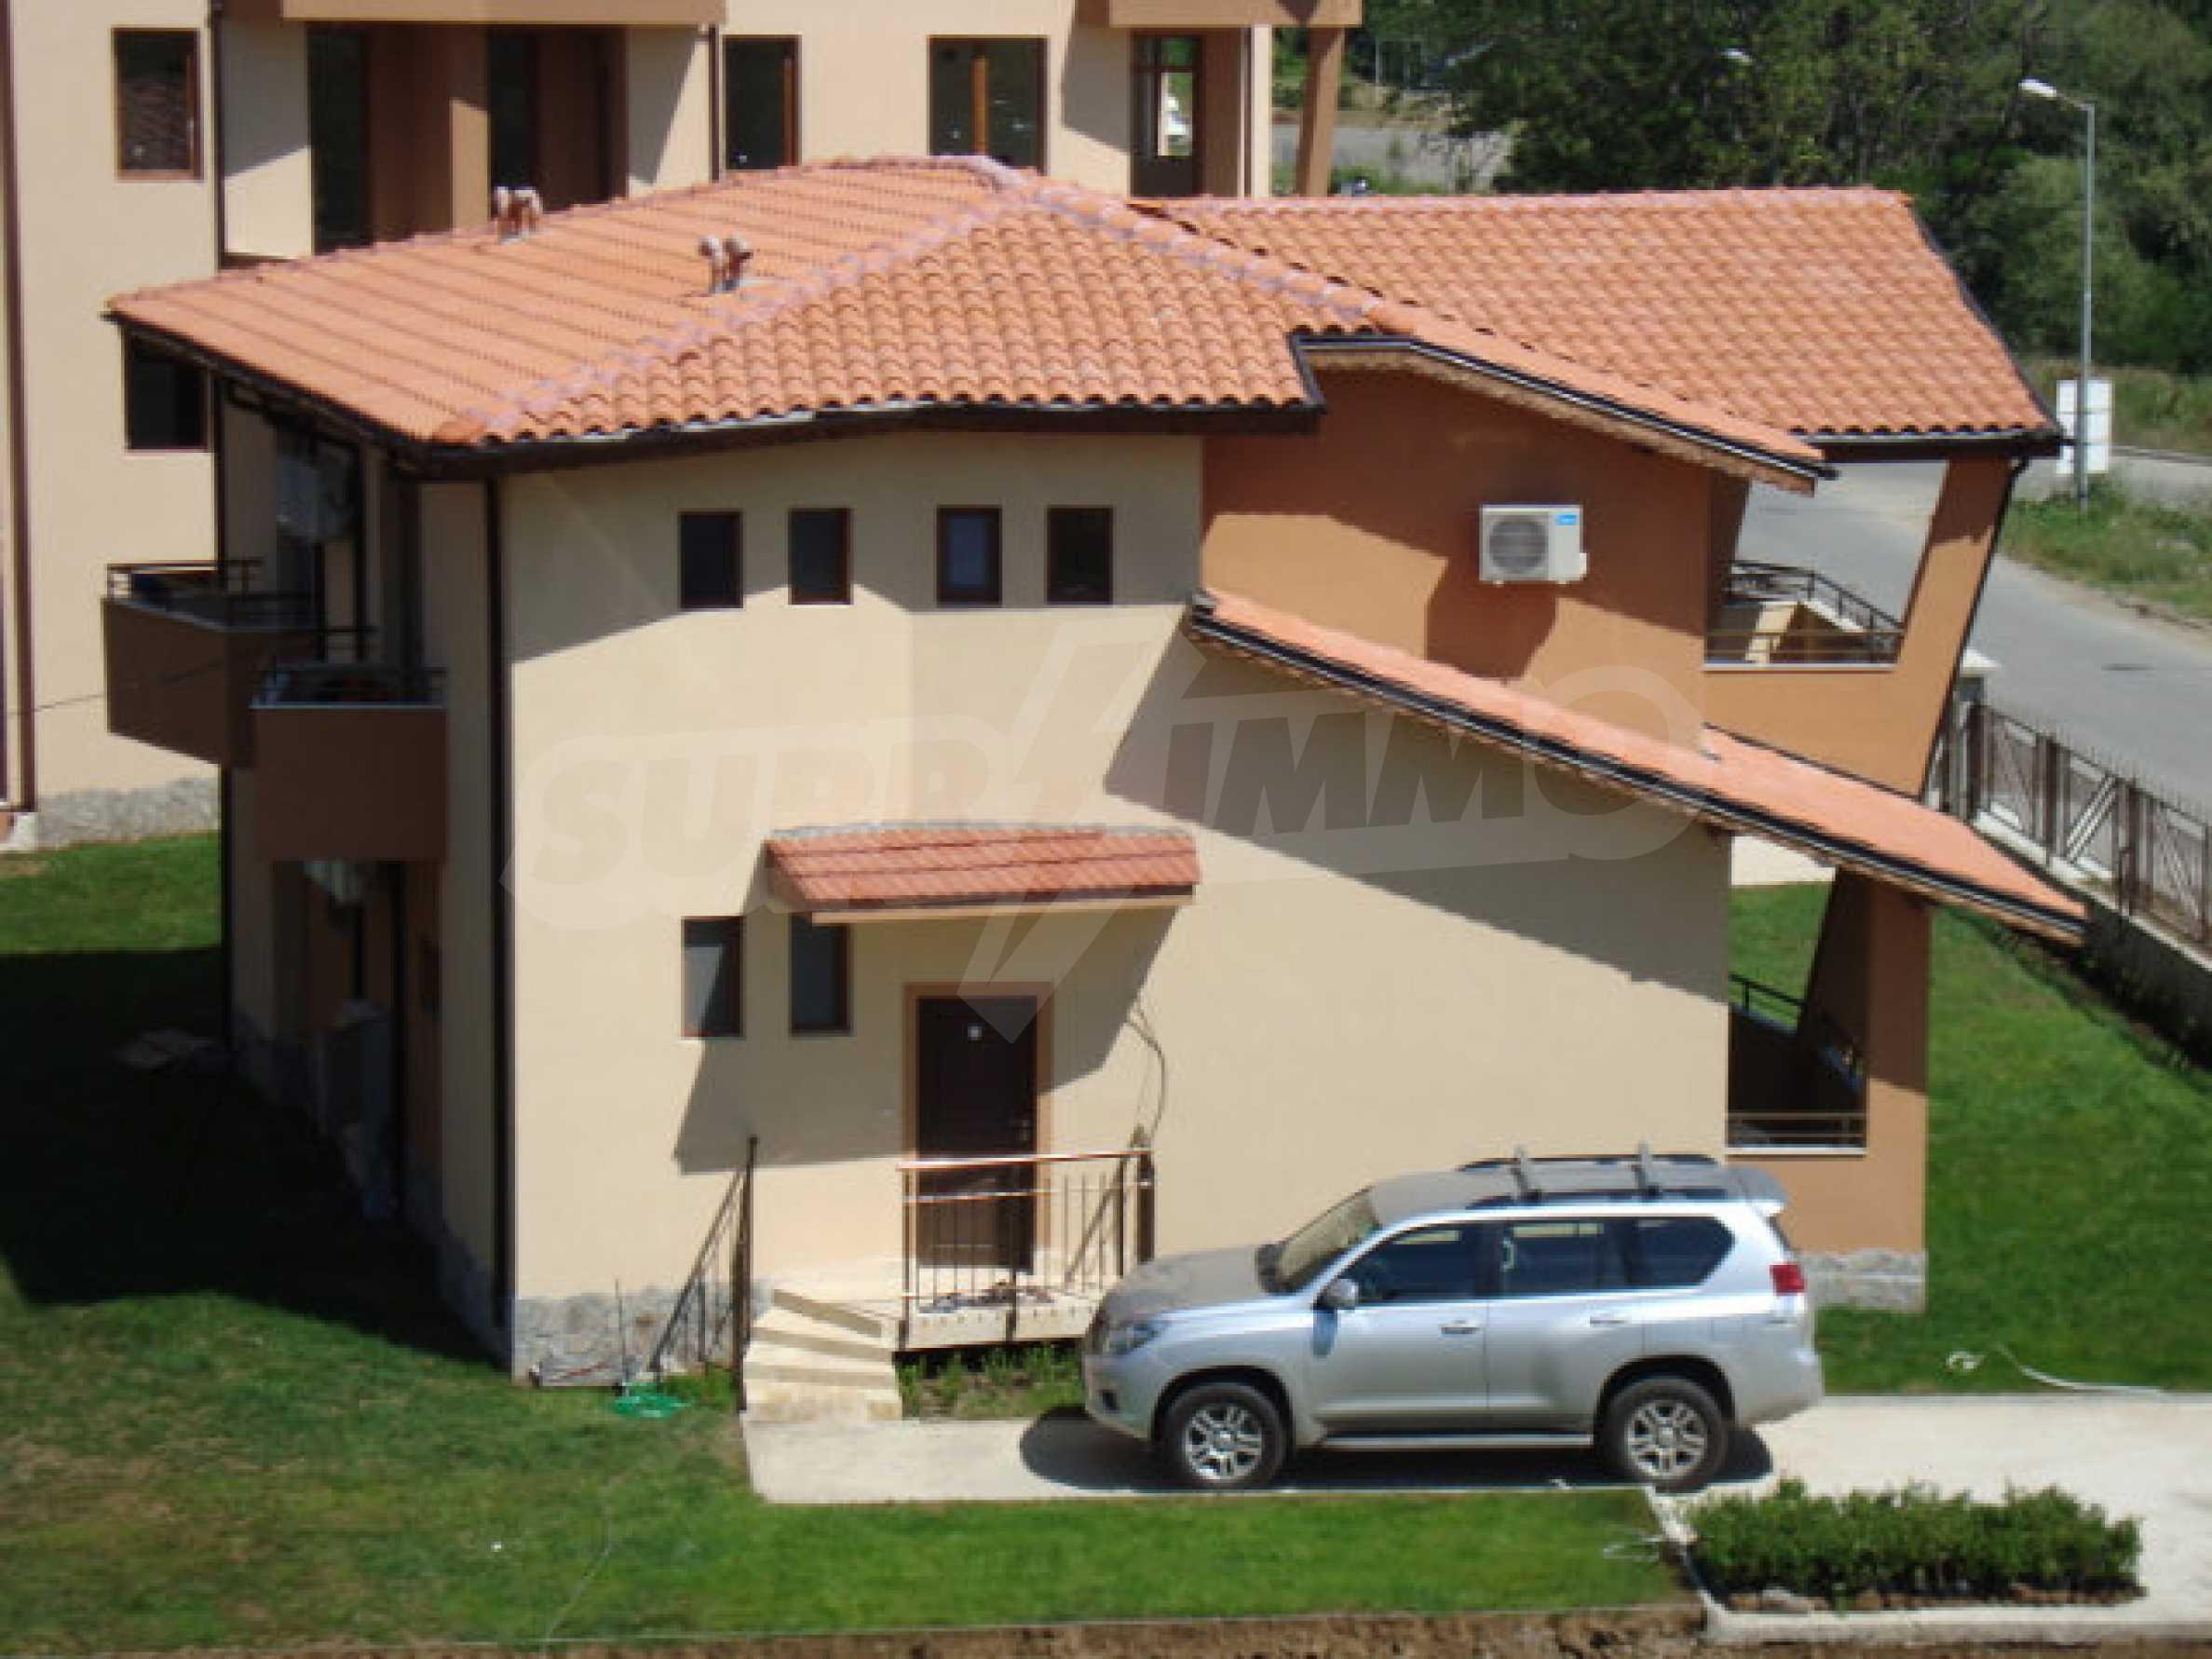 Studios und Apartments im Nestinarka-Komplex in Tsarevo 20